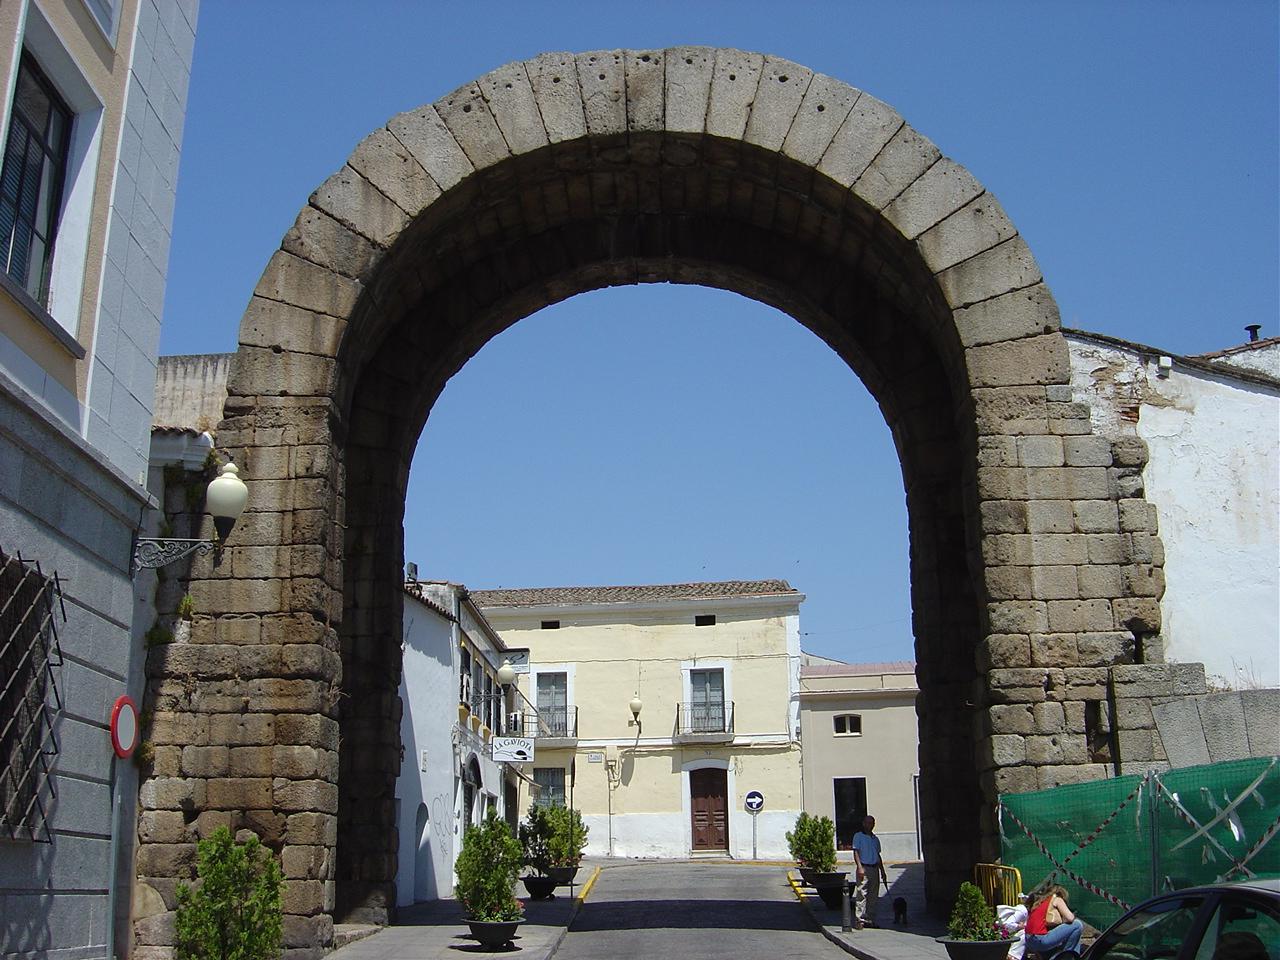 File:Merida Arco de Trajano.JPG - Wikimedia Commons